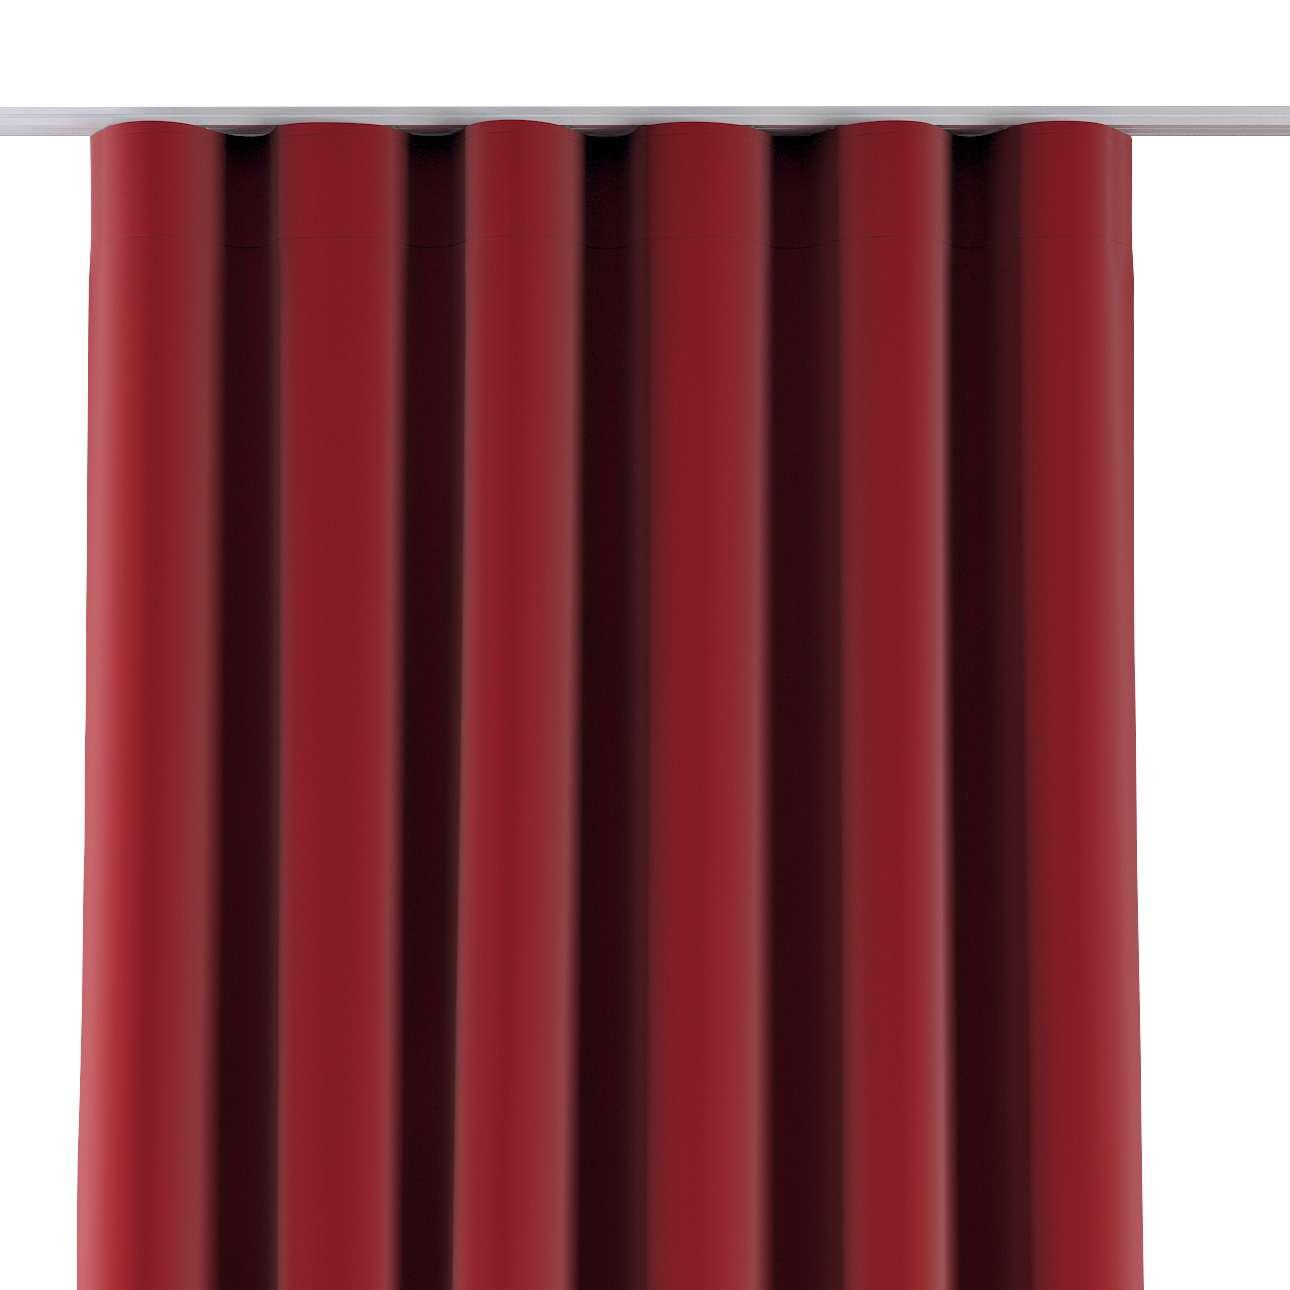 Zaves s riasením WAVE V kolekcii Velvet, tkanina: 704-15